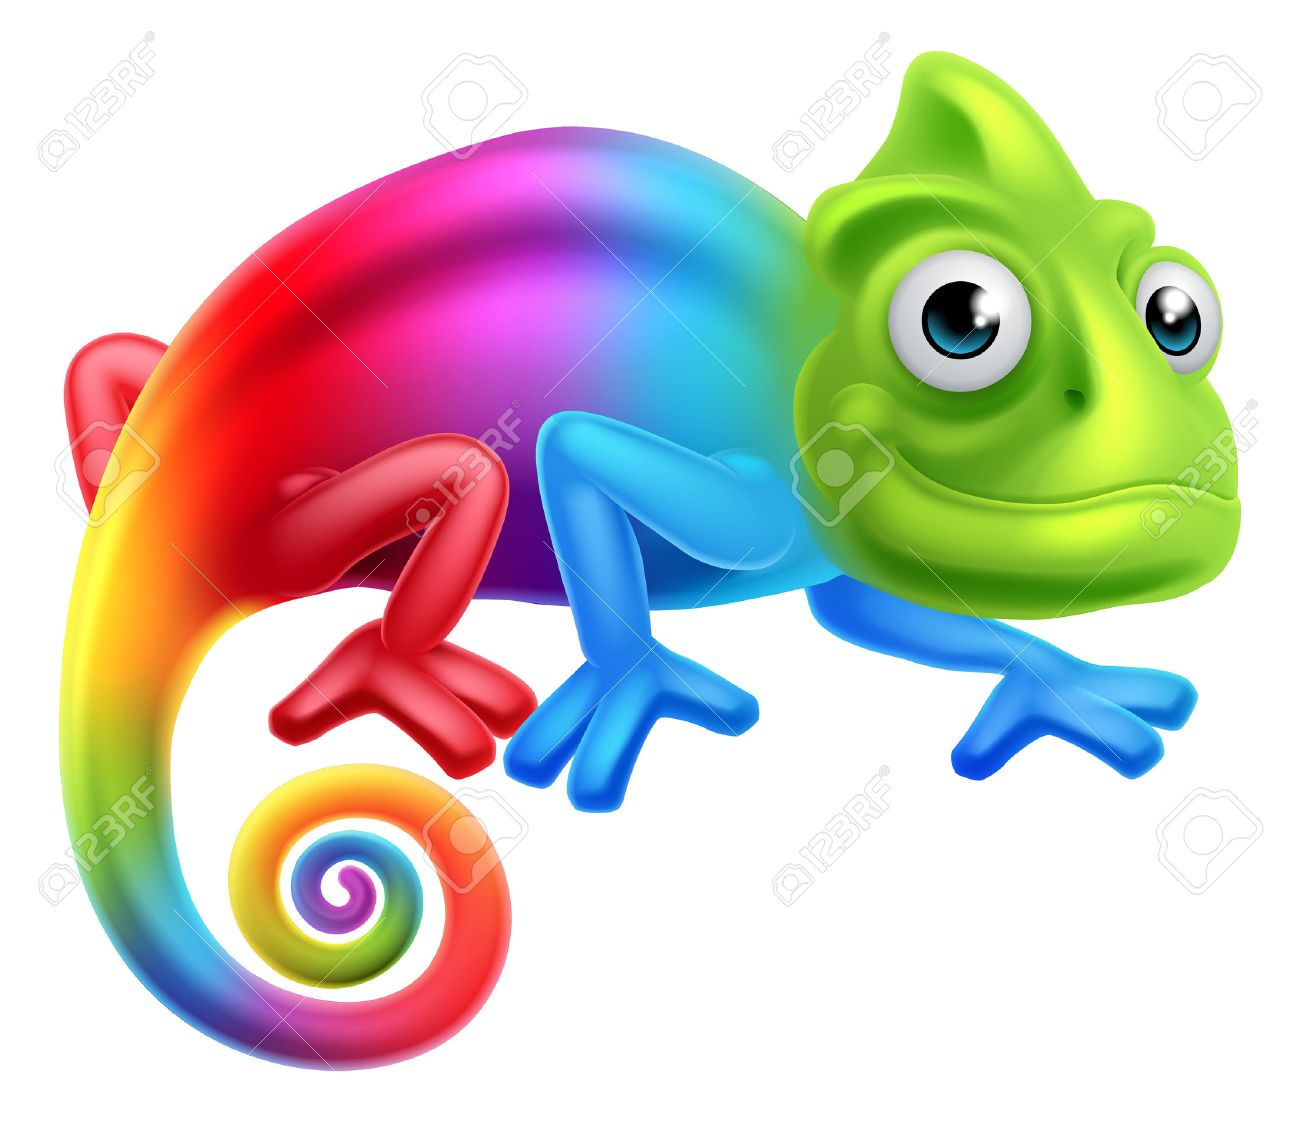 Clipart Strikingly Ideas Chameleon Clipart Chameleon Clipart Clipart  Strikingly Design Ideas